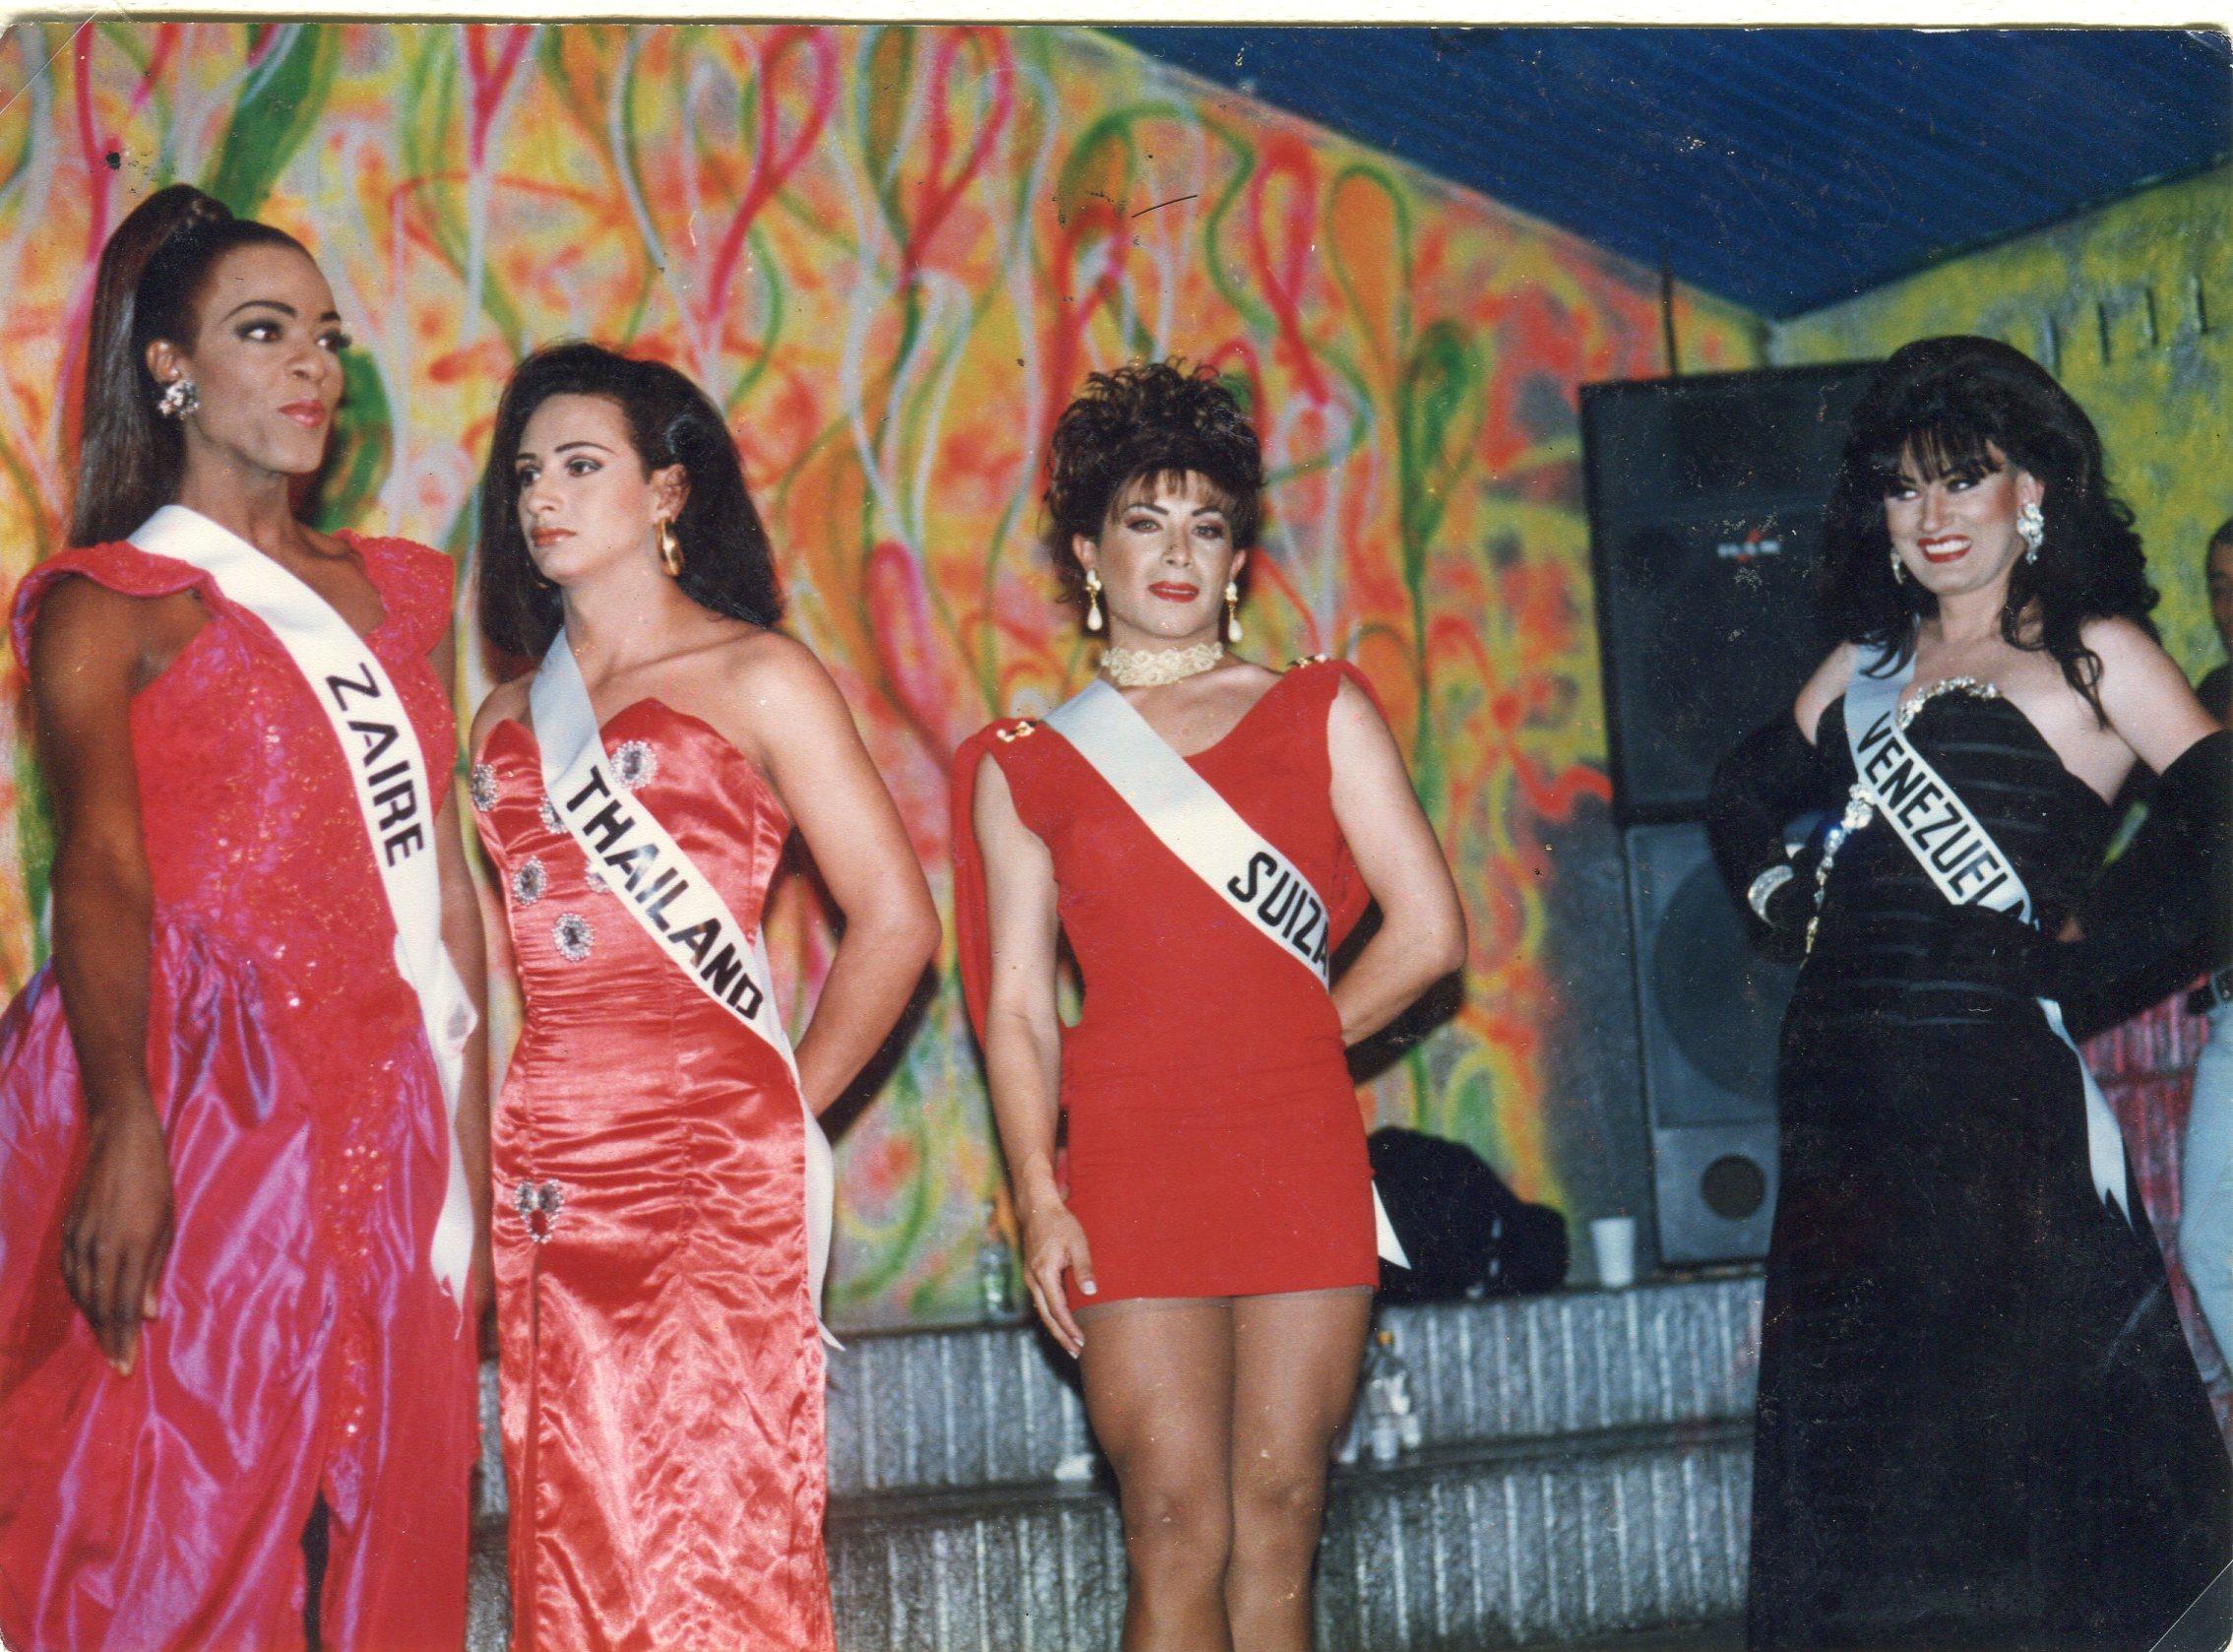 International Bambuco Trans Beauty Pageant. Courtesy of the Akrhé Foundation.